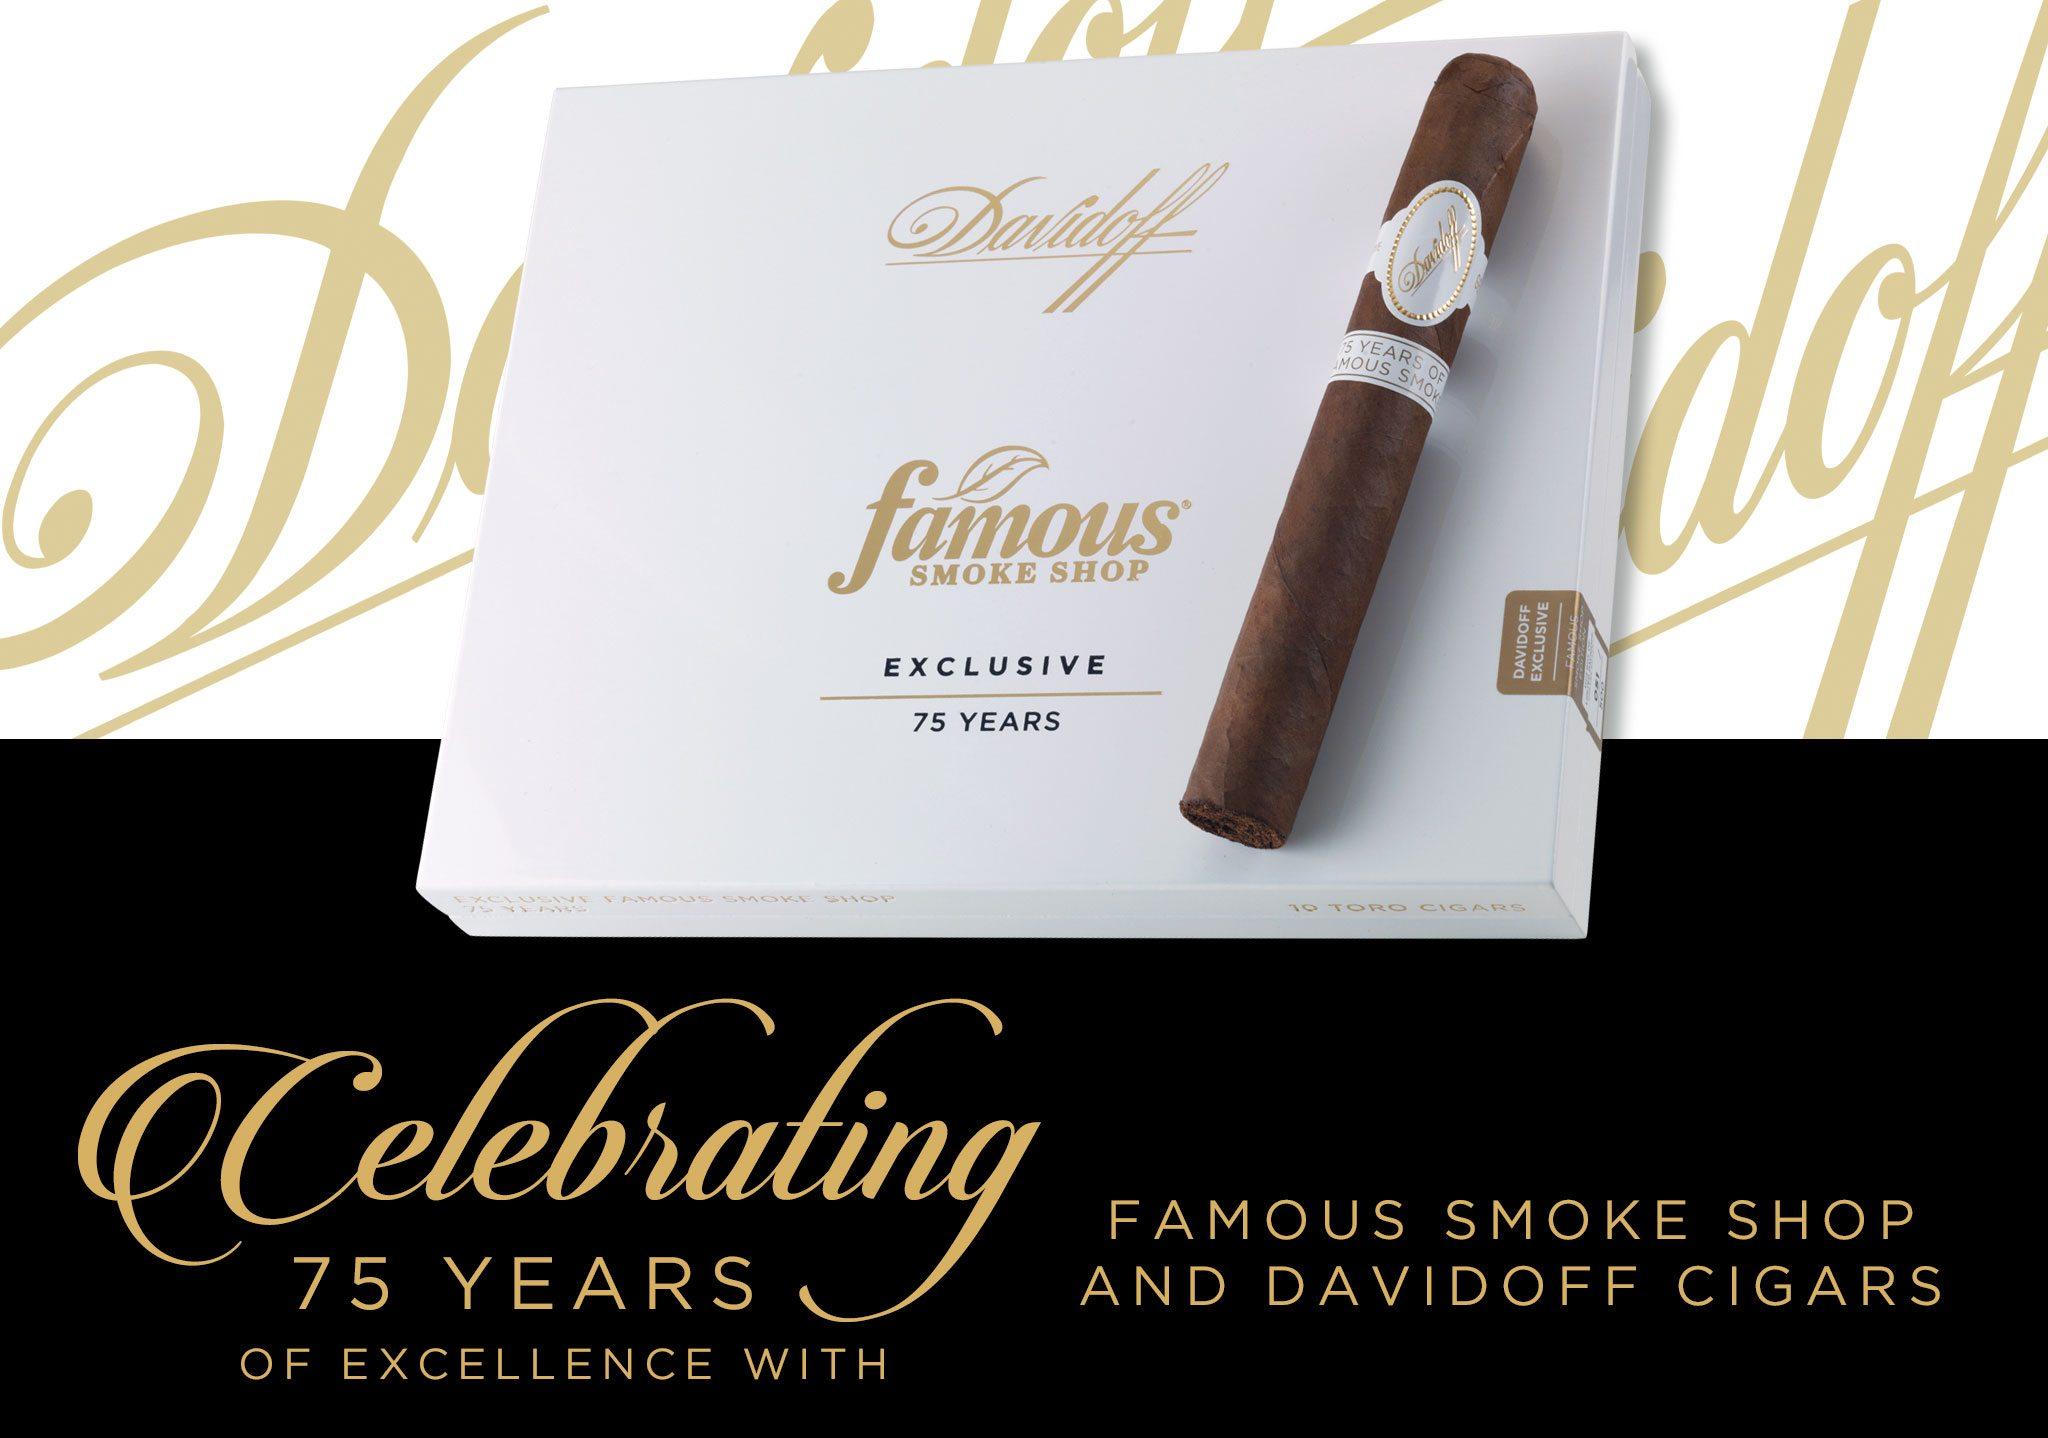 Cigar News: Famous Announces Davidoff 75th Anniversary Cigars